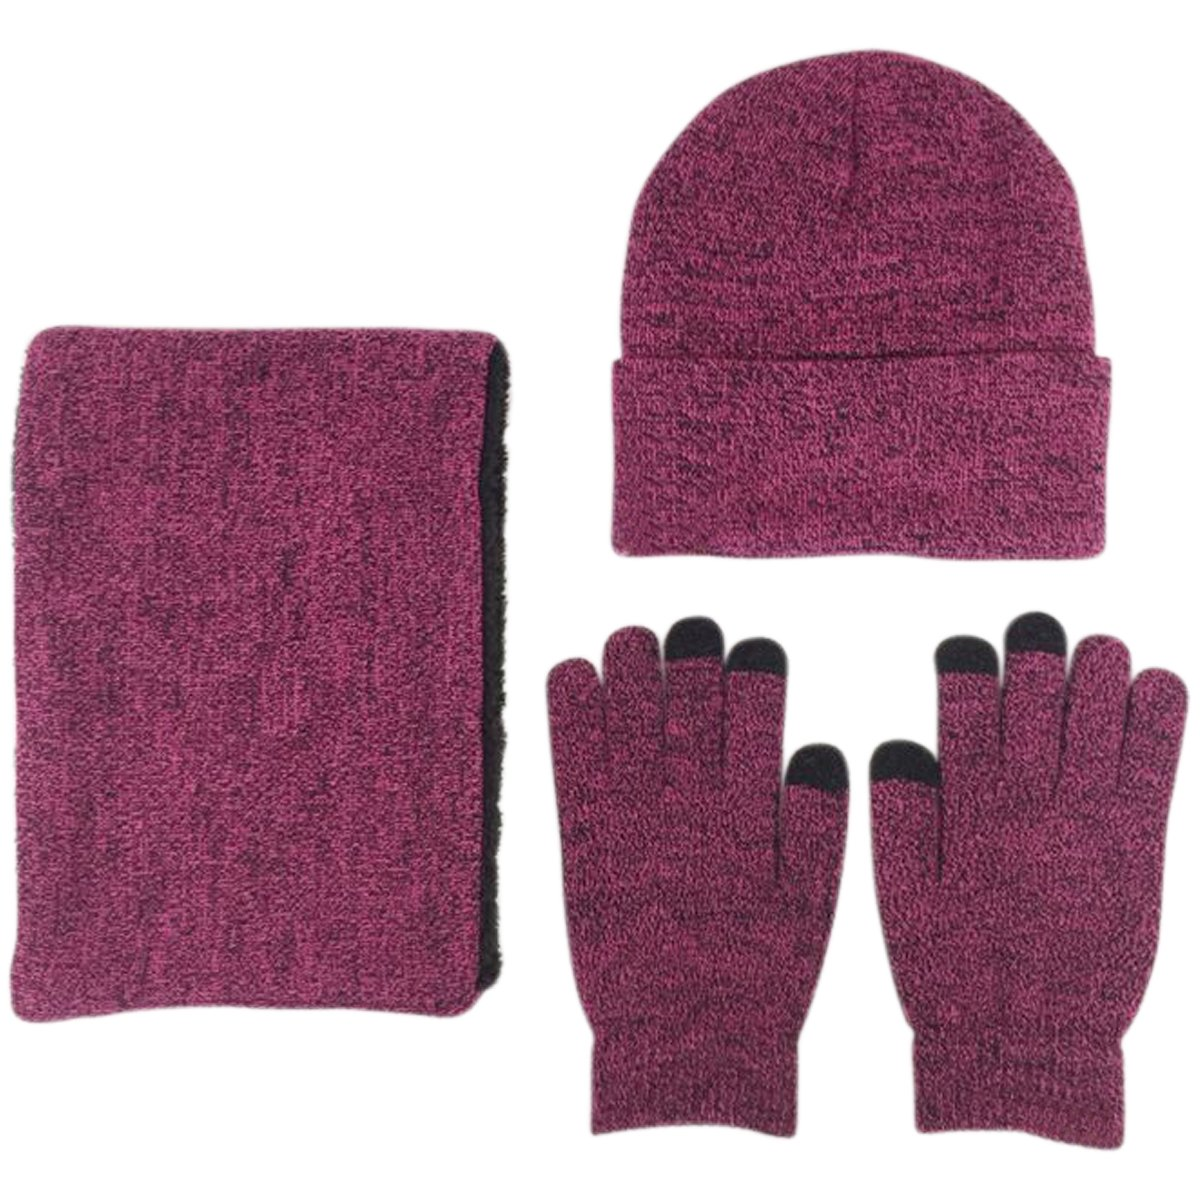 JOYEBUY Men 3 PCS Knitted Set Winter Warm Knit Hat + Scarf + Touch Screen Gloves (Rose)